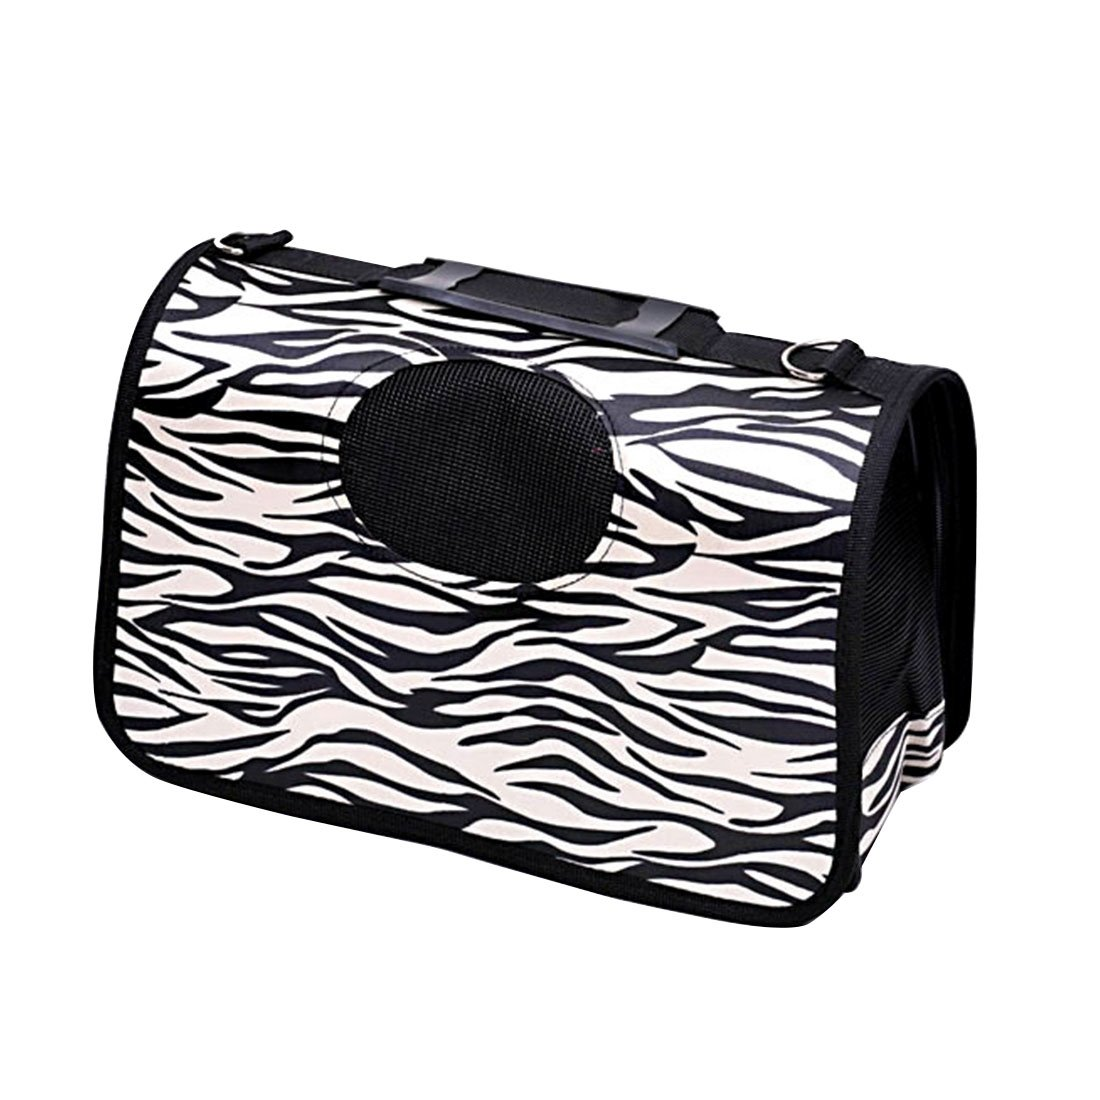 Hc2874l Pet Supplies Portable Pet Handbag Shoulder Bag for Cat Dog and Other Pets Small, Size 34  18  24cm (SKU   Hc2874f)